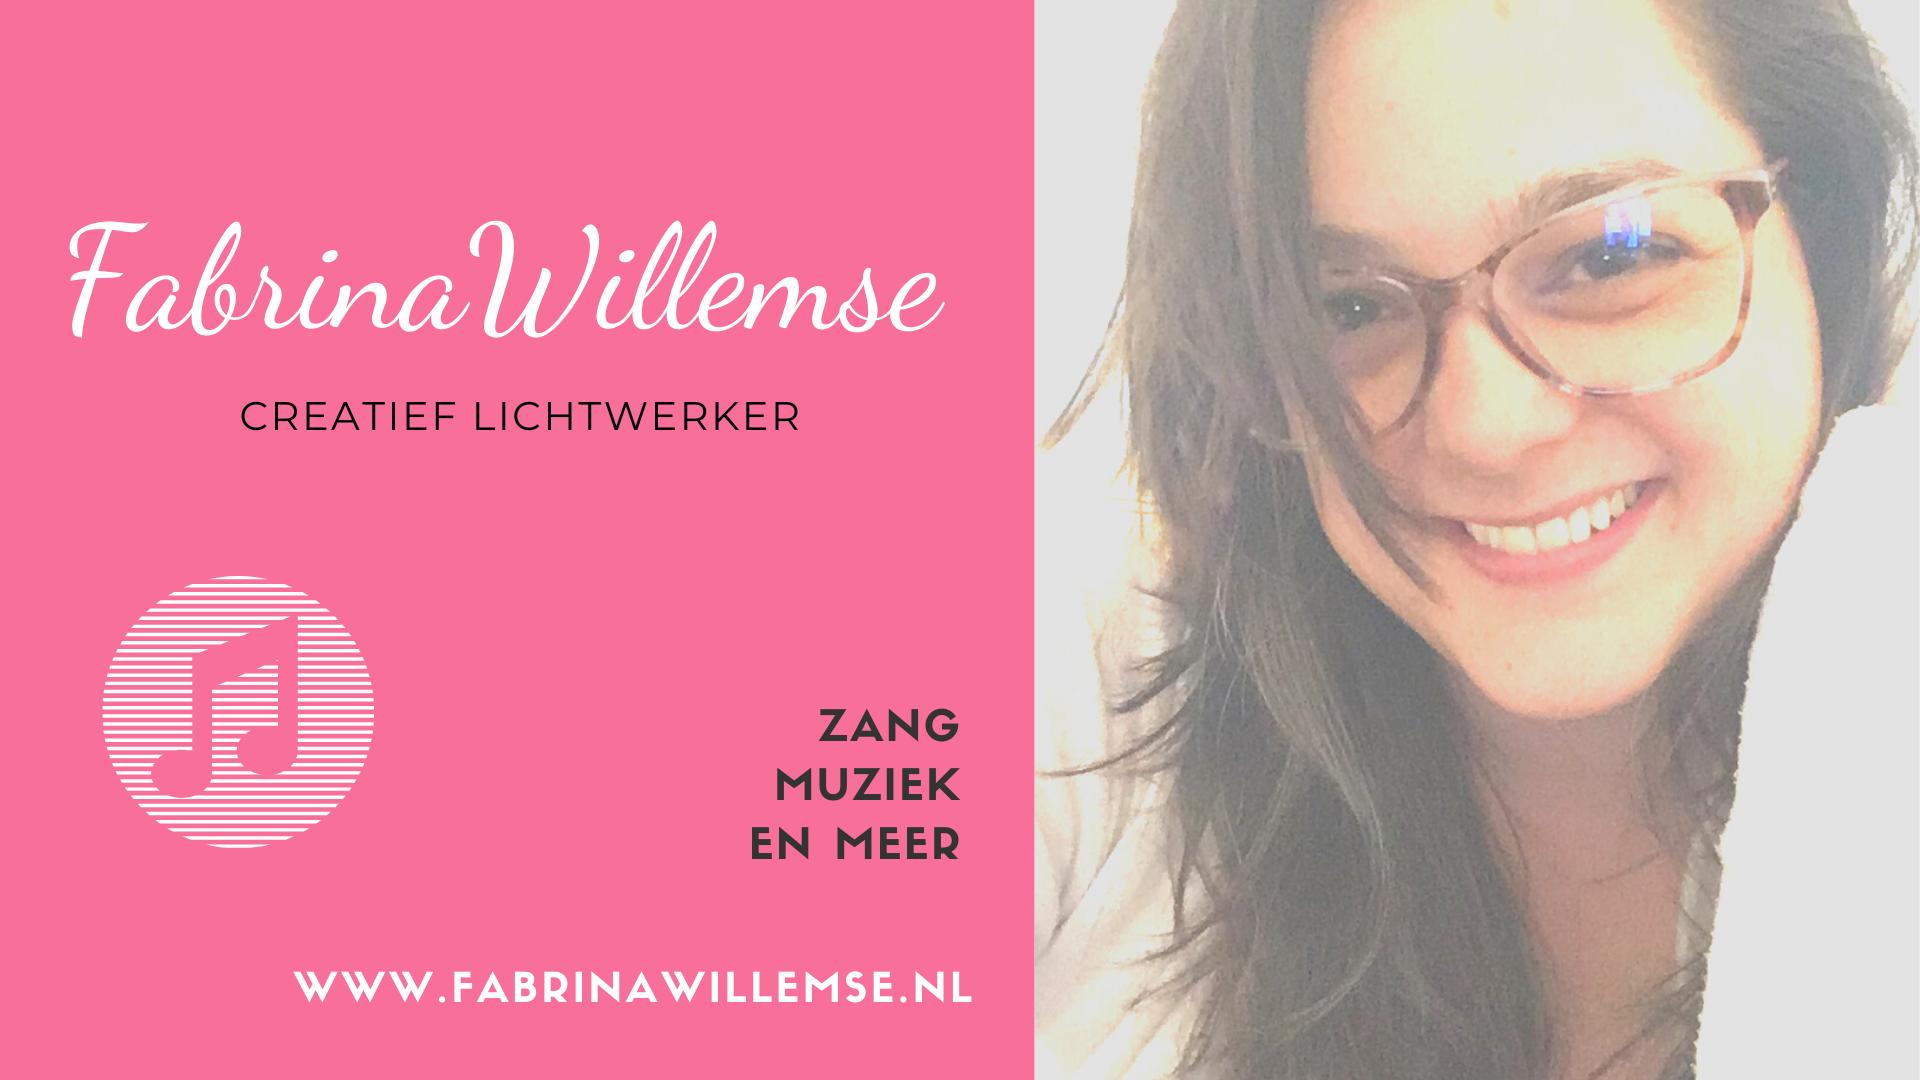 Fabrina Willemse